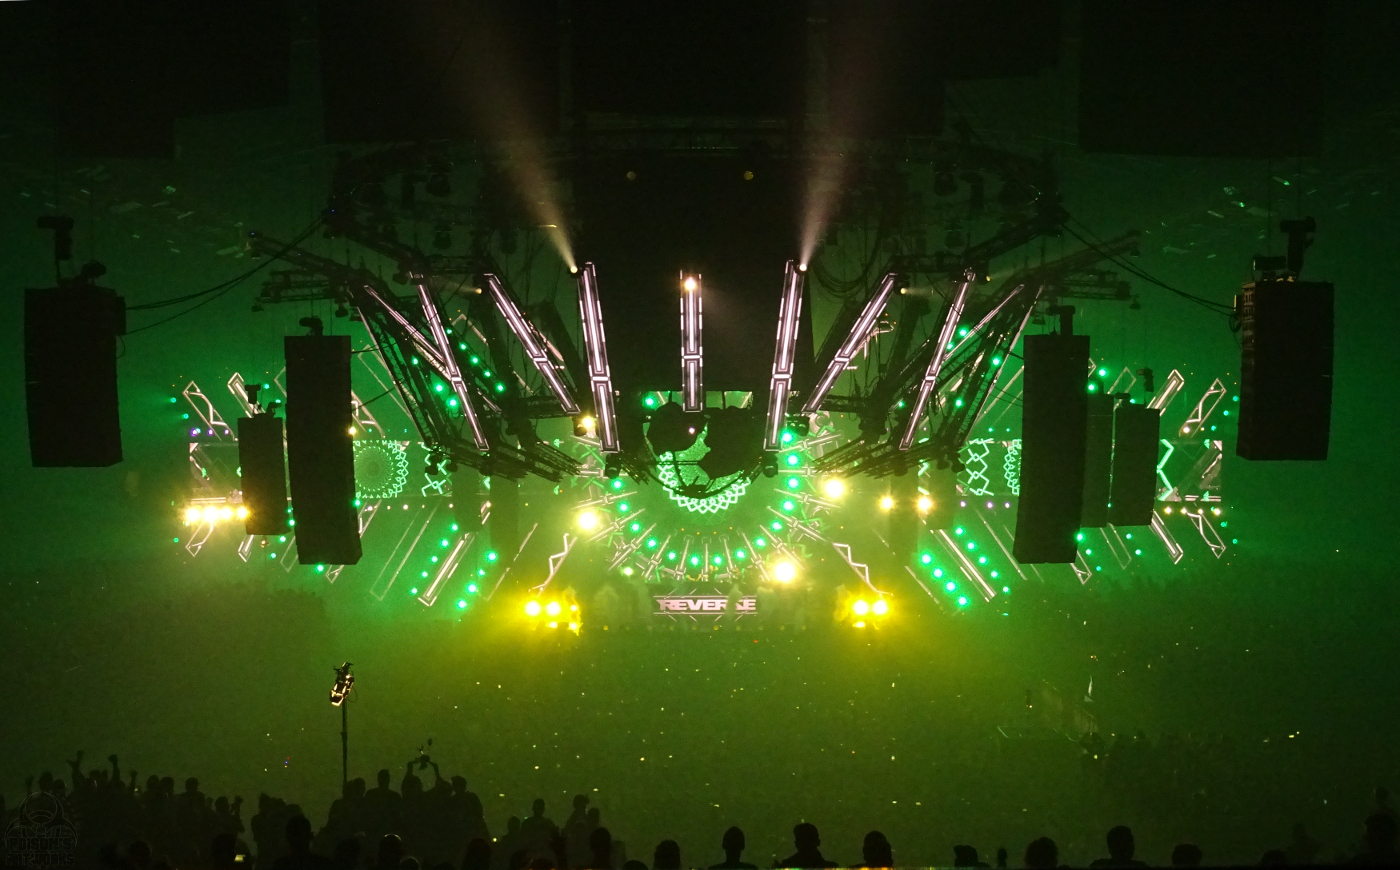 REVERZE - 7 Mars 2020 - Sportpaleis/Lotto Arena - Anvers - BE DSC04877crSW